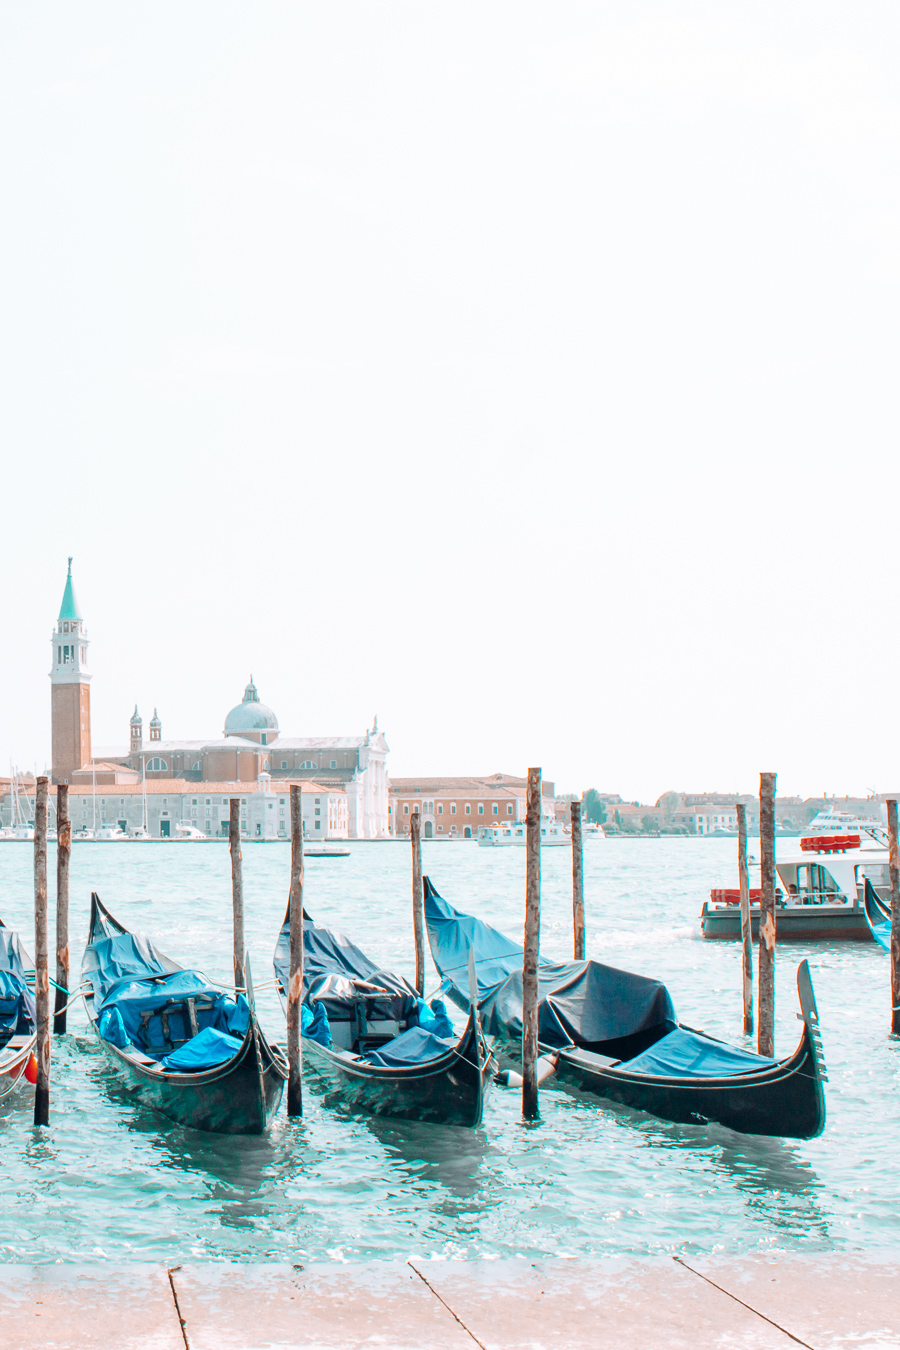 Gondolas in the beautiful city of Venice